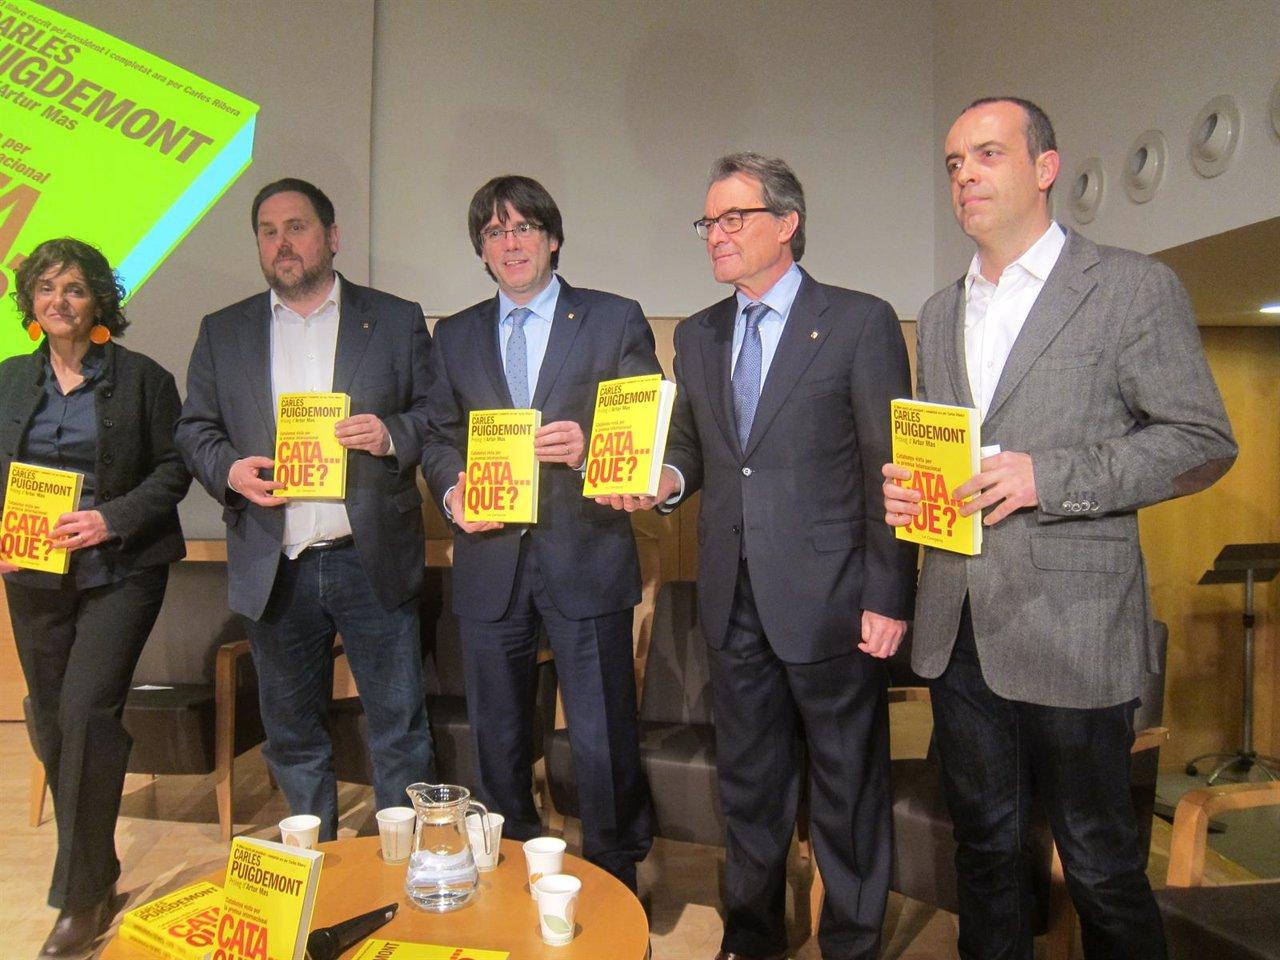 Oriol Junqueras, Carles Puigdemont, Artur Mas, Carles Ribera